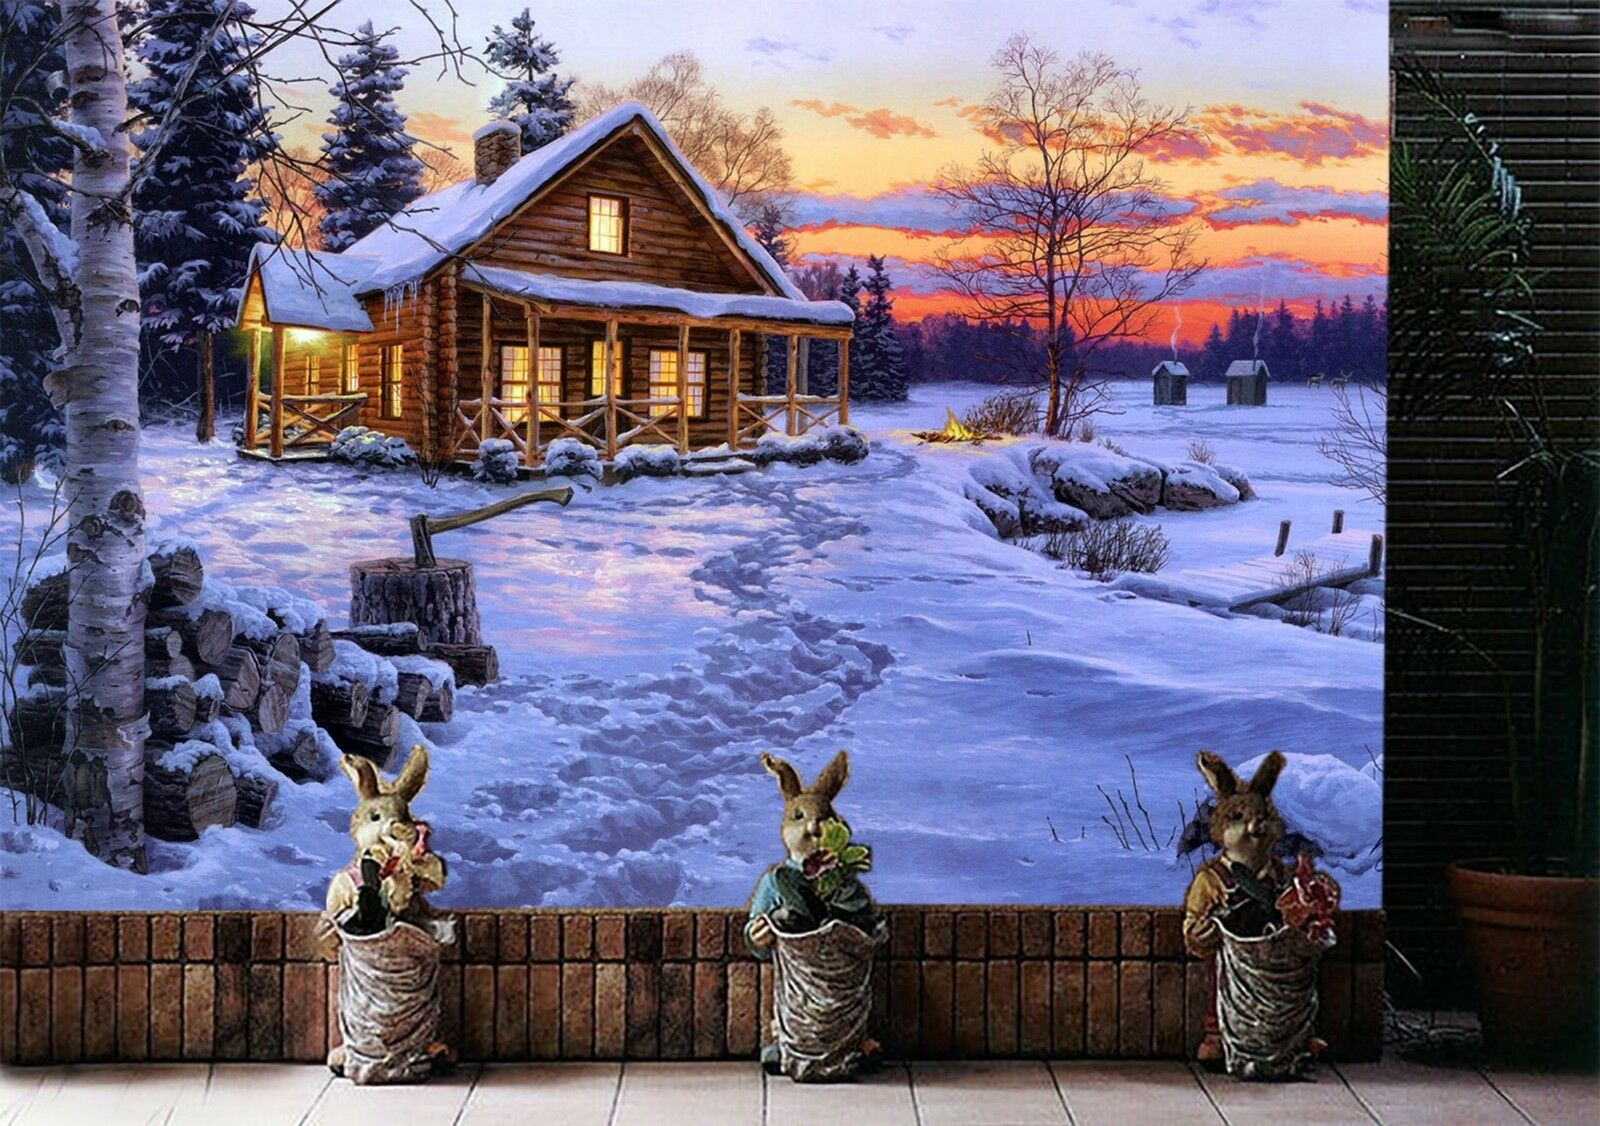 3D Winter Haus Landschaft 8732 Tapete Wandgemälde Tapeten Bild Familie DE Lemon  | Deutschland Berlin  | Offizielle  | Deutschland